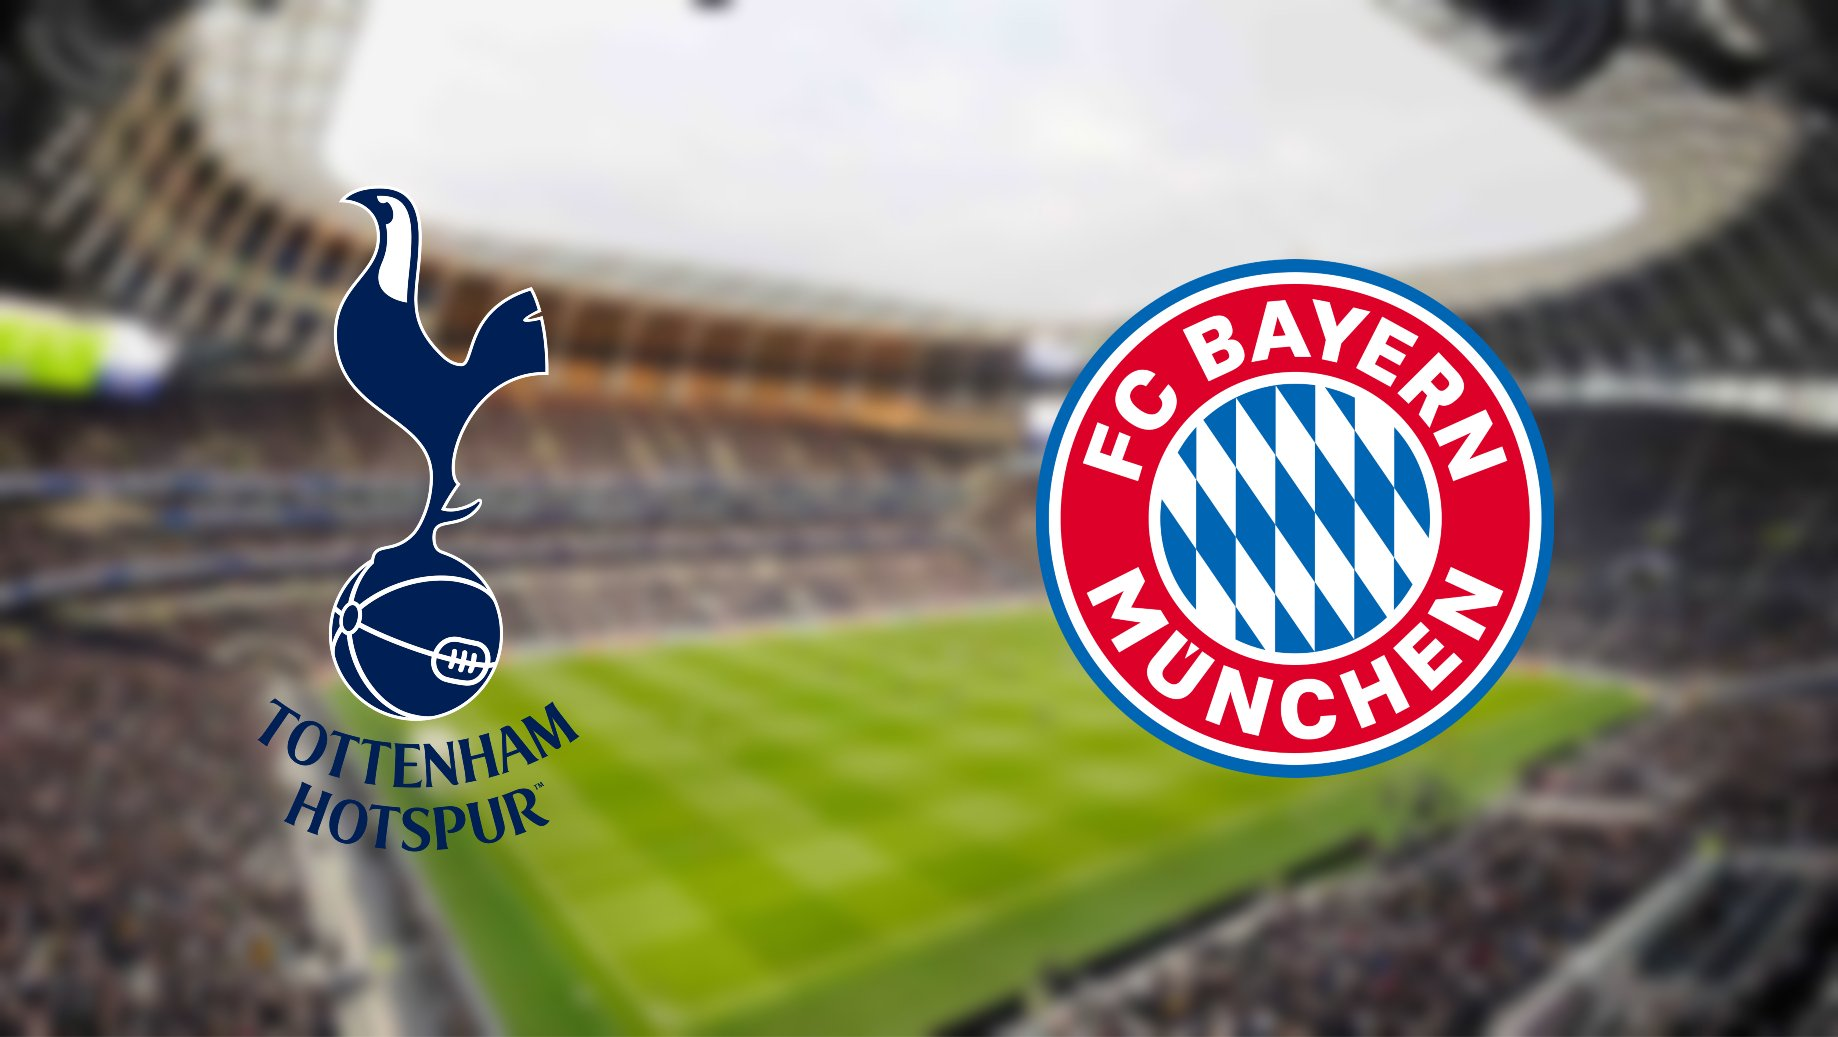 Tottenham Hotspur vs Bayern Munich Prediction: 01.10.2019 Champions League